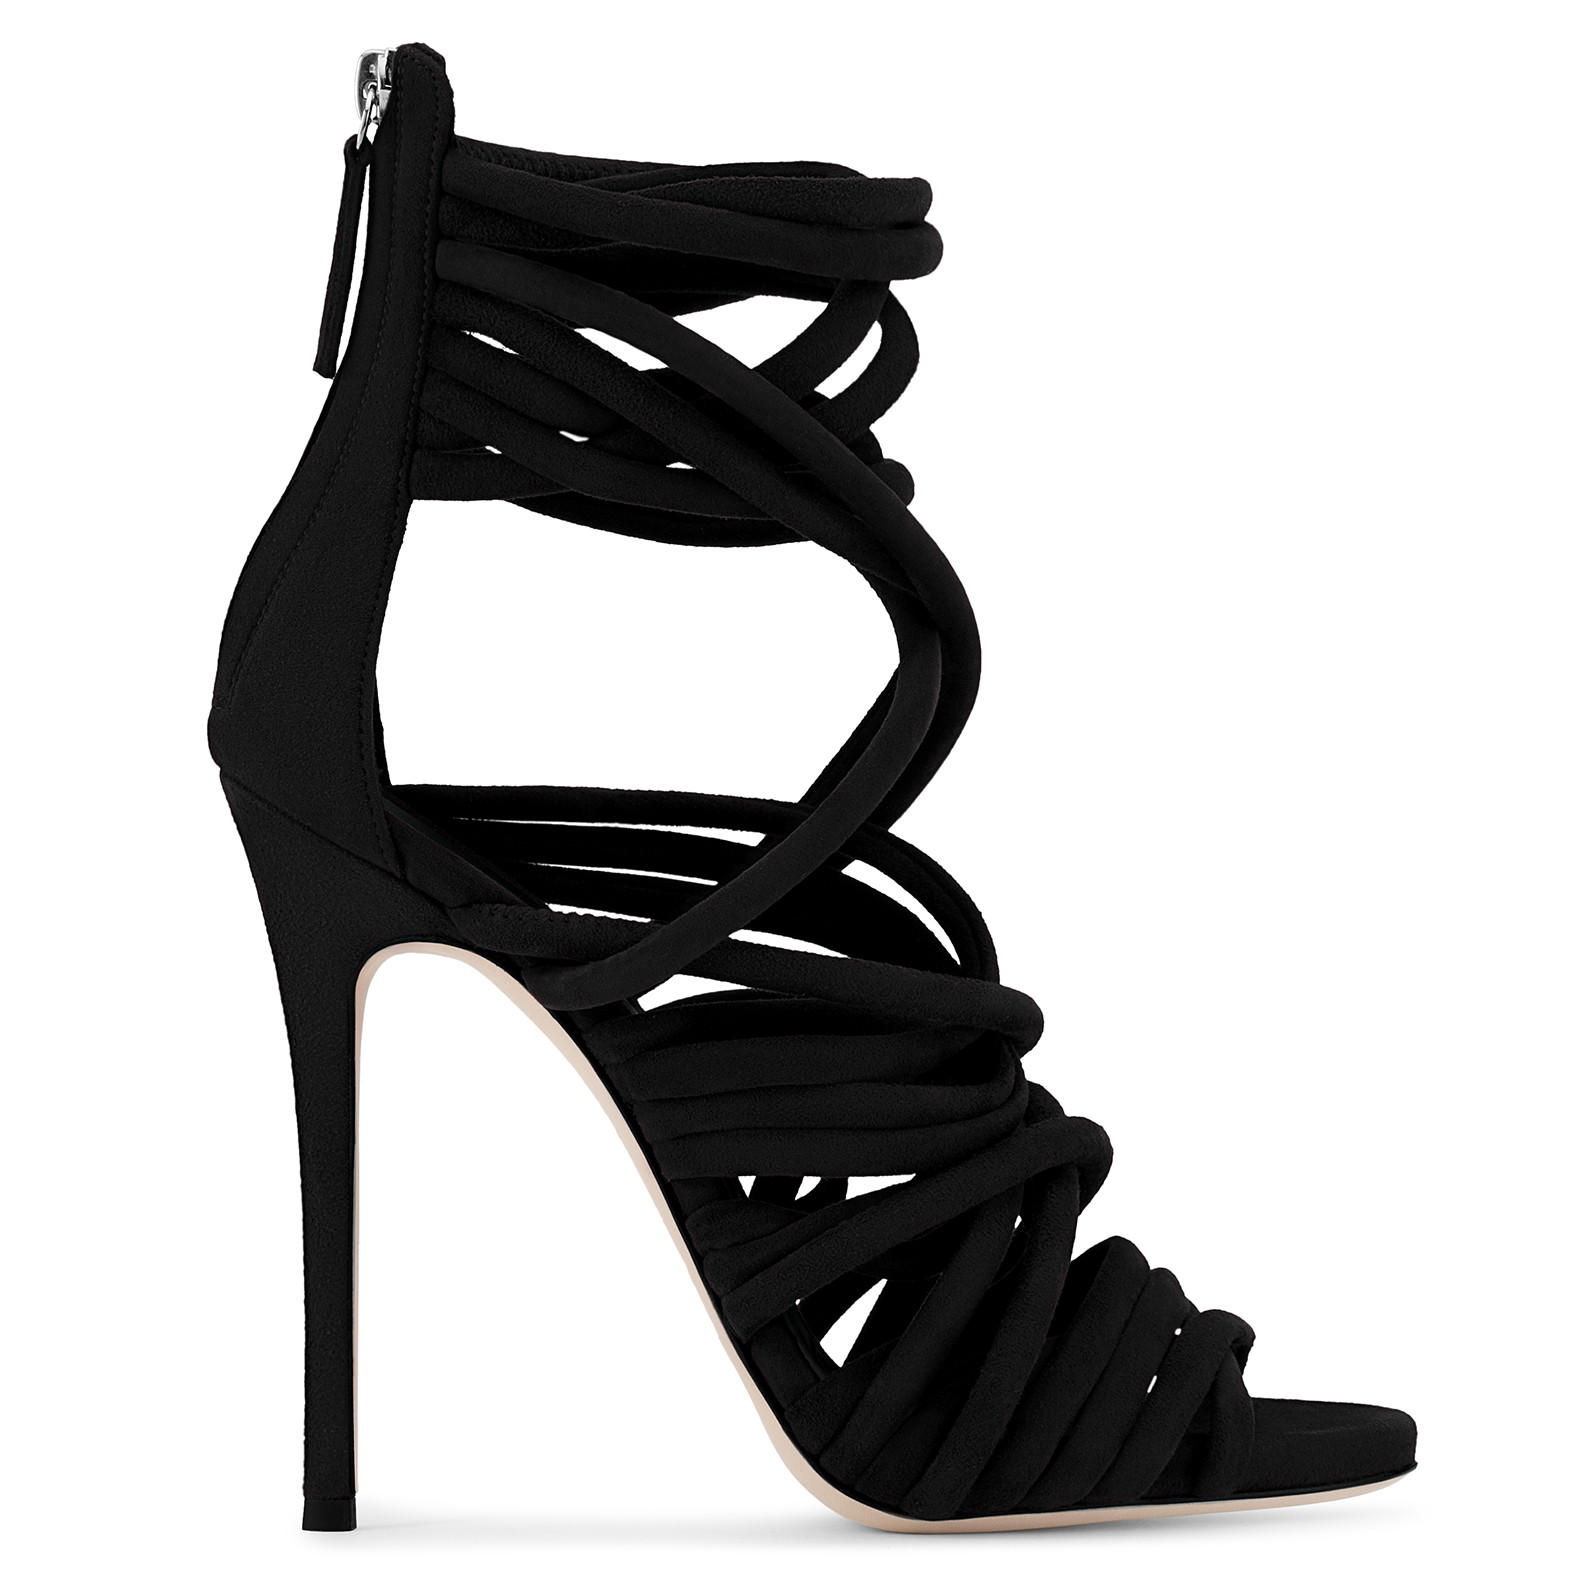 "GIUSEPPE ZANOTTI ""Runway"" Multi-Strap Sandals in Nero"